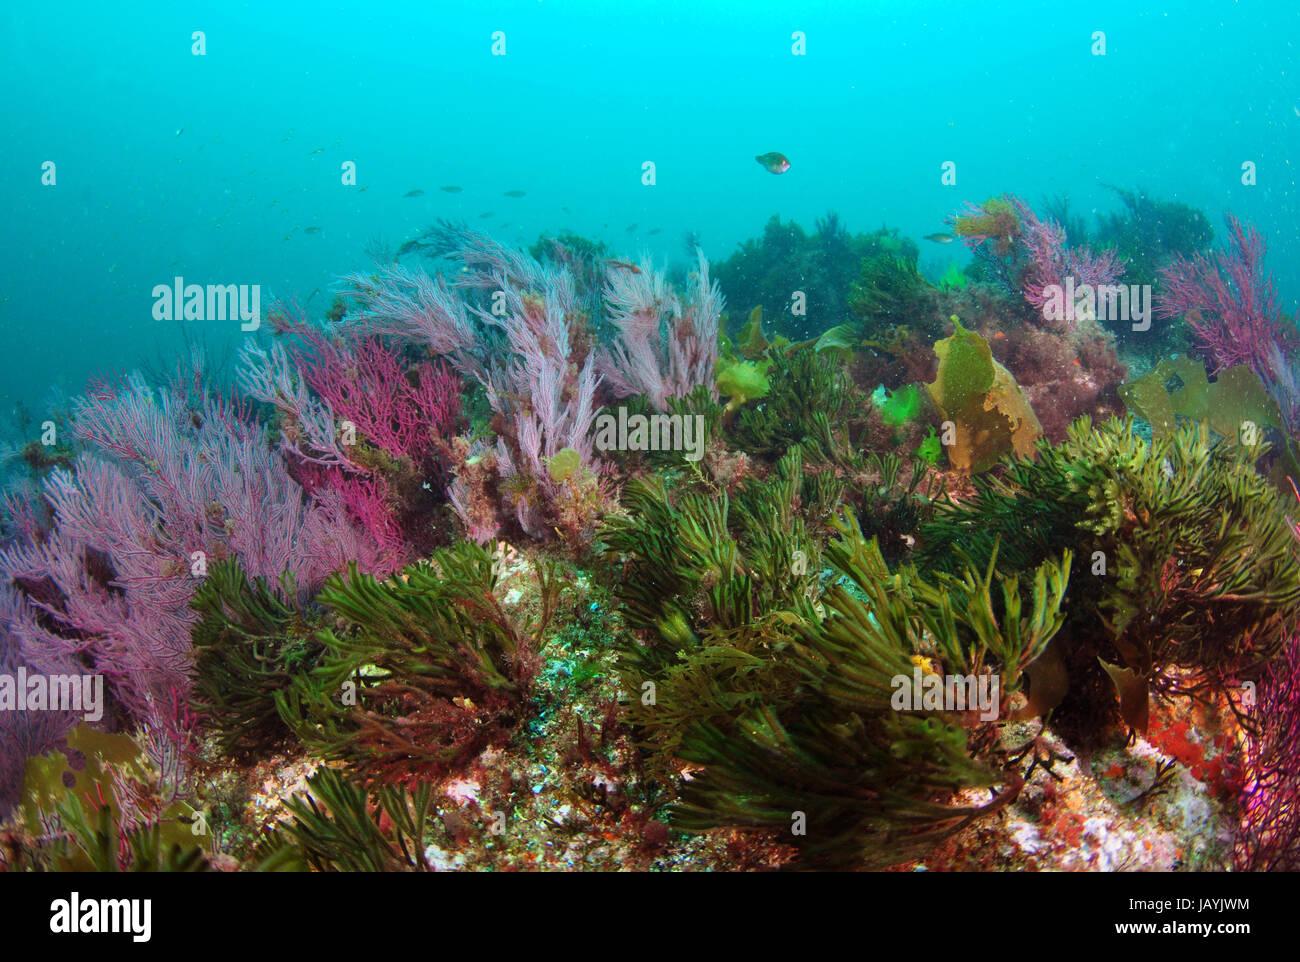 Atlantic Ocean underwater ecosystem with different algae and soft corals - Stock Image